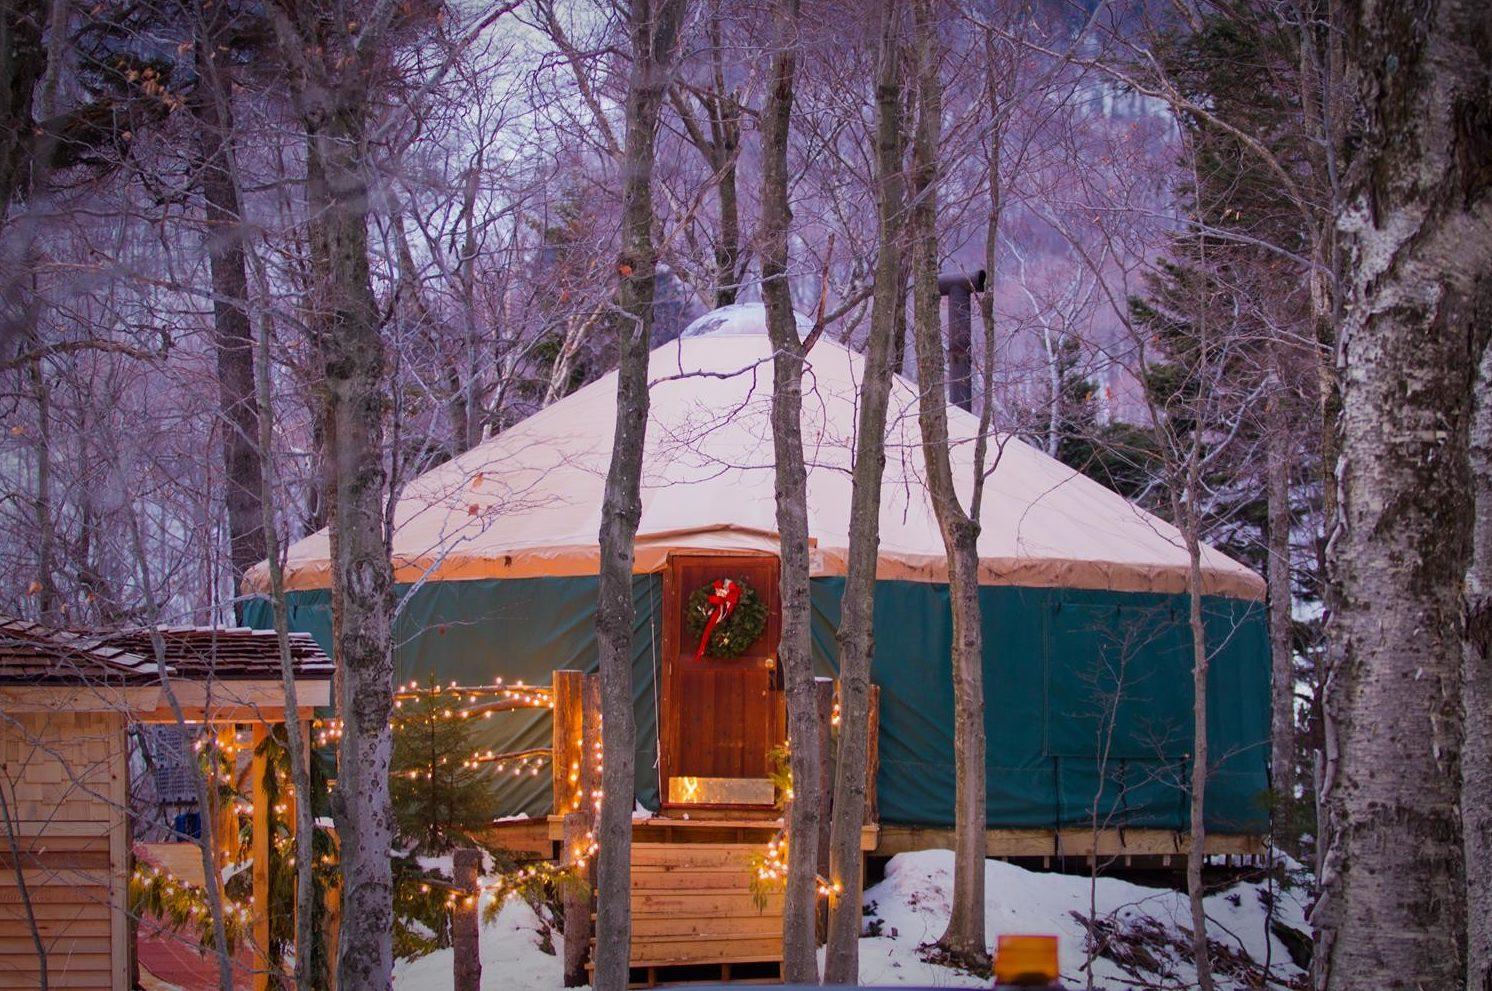 Fine dining on the mountain ledgewood yurt jackson house fine dining on the mountain ledgewood yurt kristyandbryce Gallery